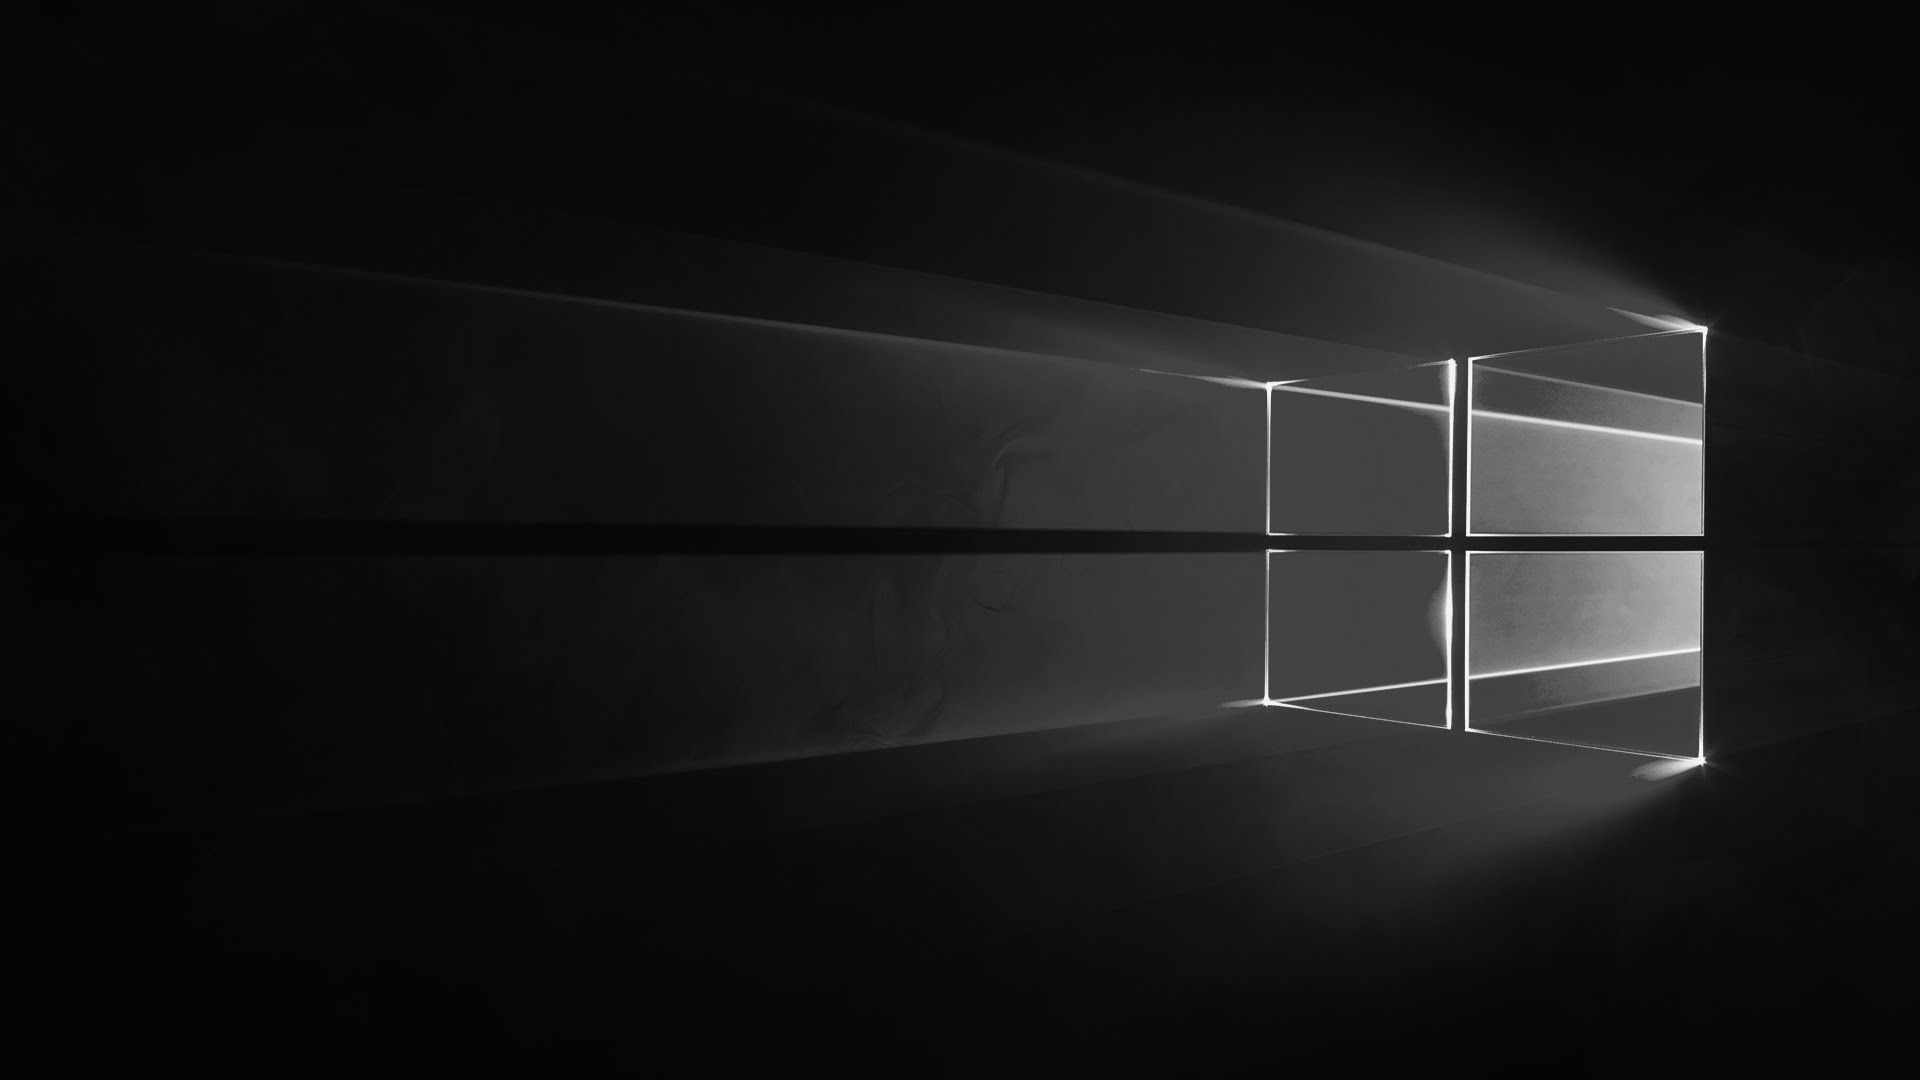 Windows 10 Black Wallpaper   Data-src /full/220764 - Windows 10 Black Wallpaper 1080p - HD Wallpaper